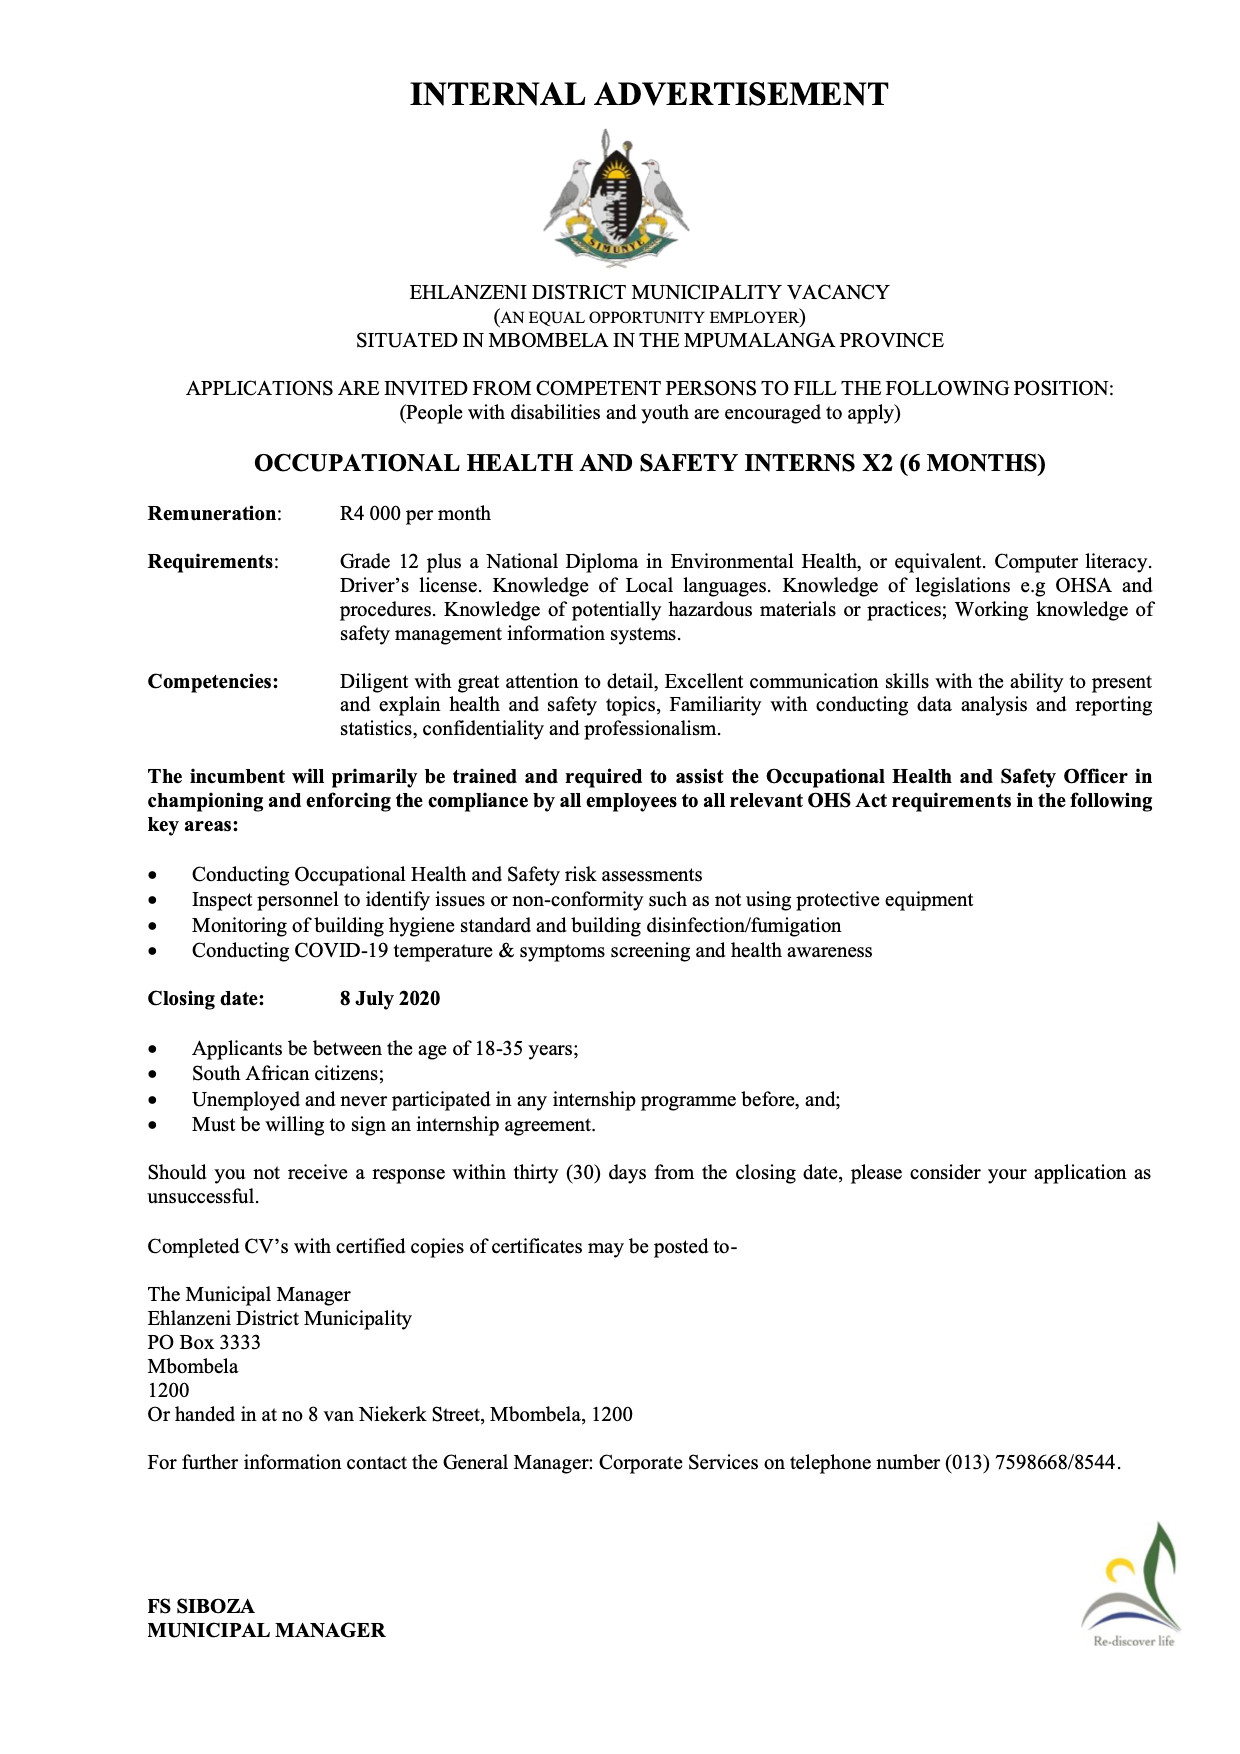 Advert - OHS intern 6 months copy.jpg